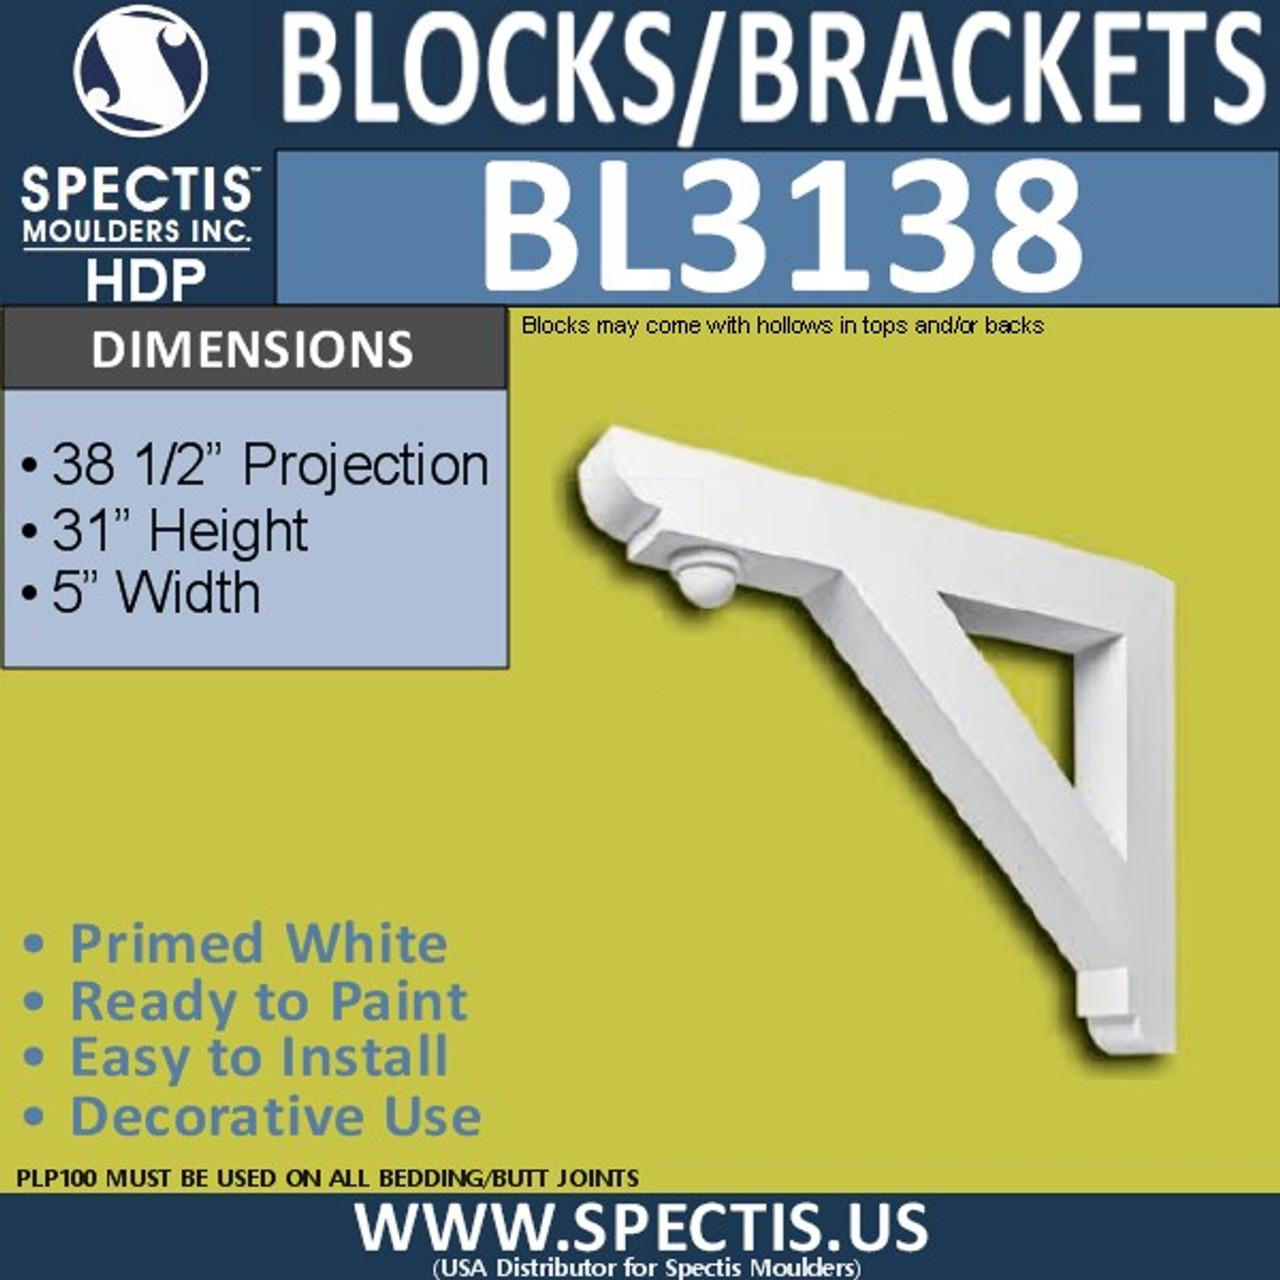 "BL3138 Eave Block or Bracket 5""W x 31""H x 38.5""P"